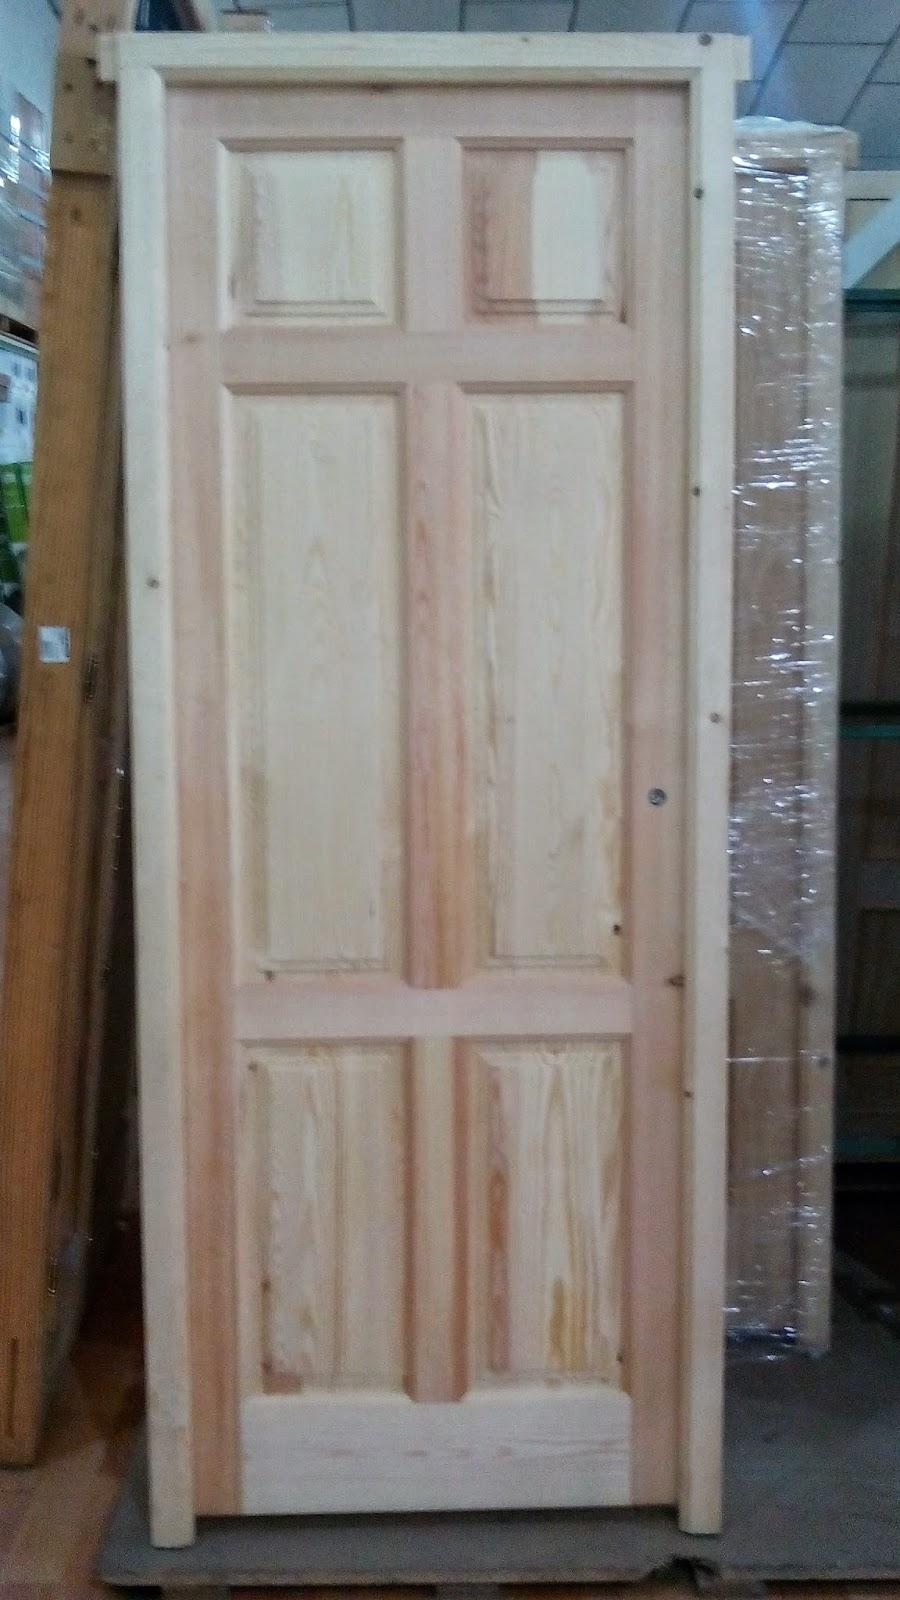 Puerta de madera maciza m6 de interior y exterior for Puertas de madera maciza